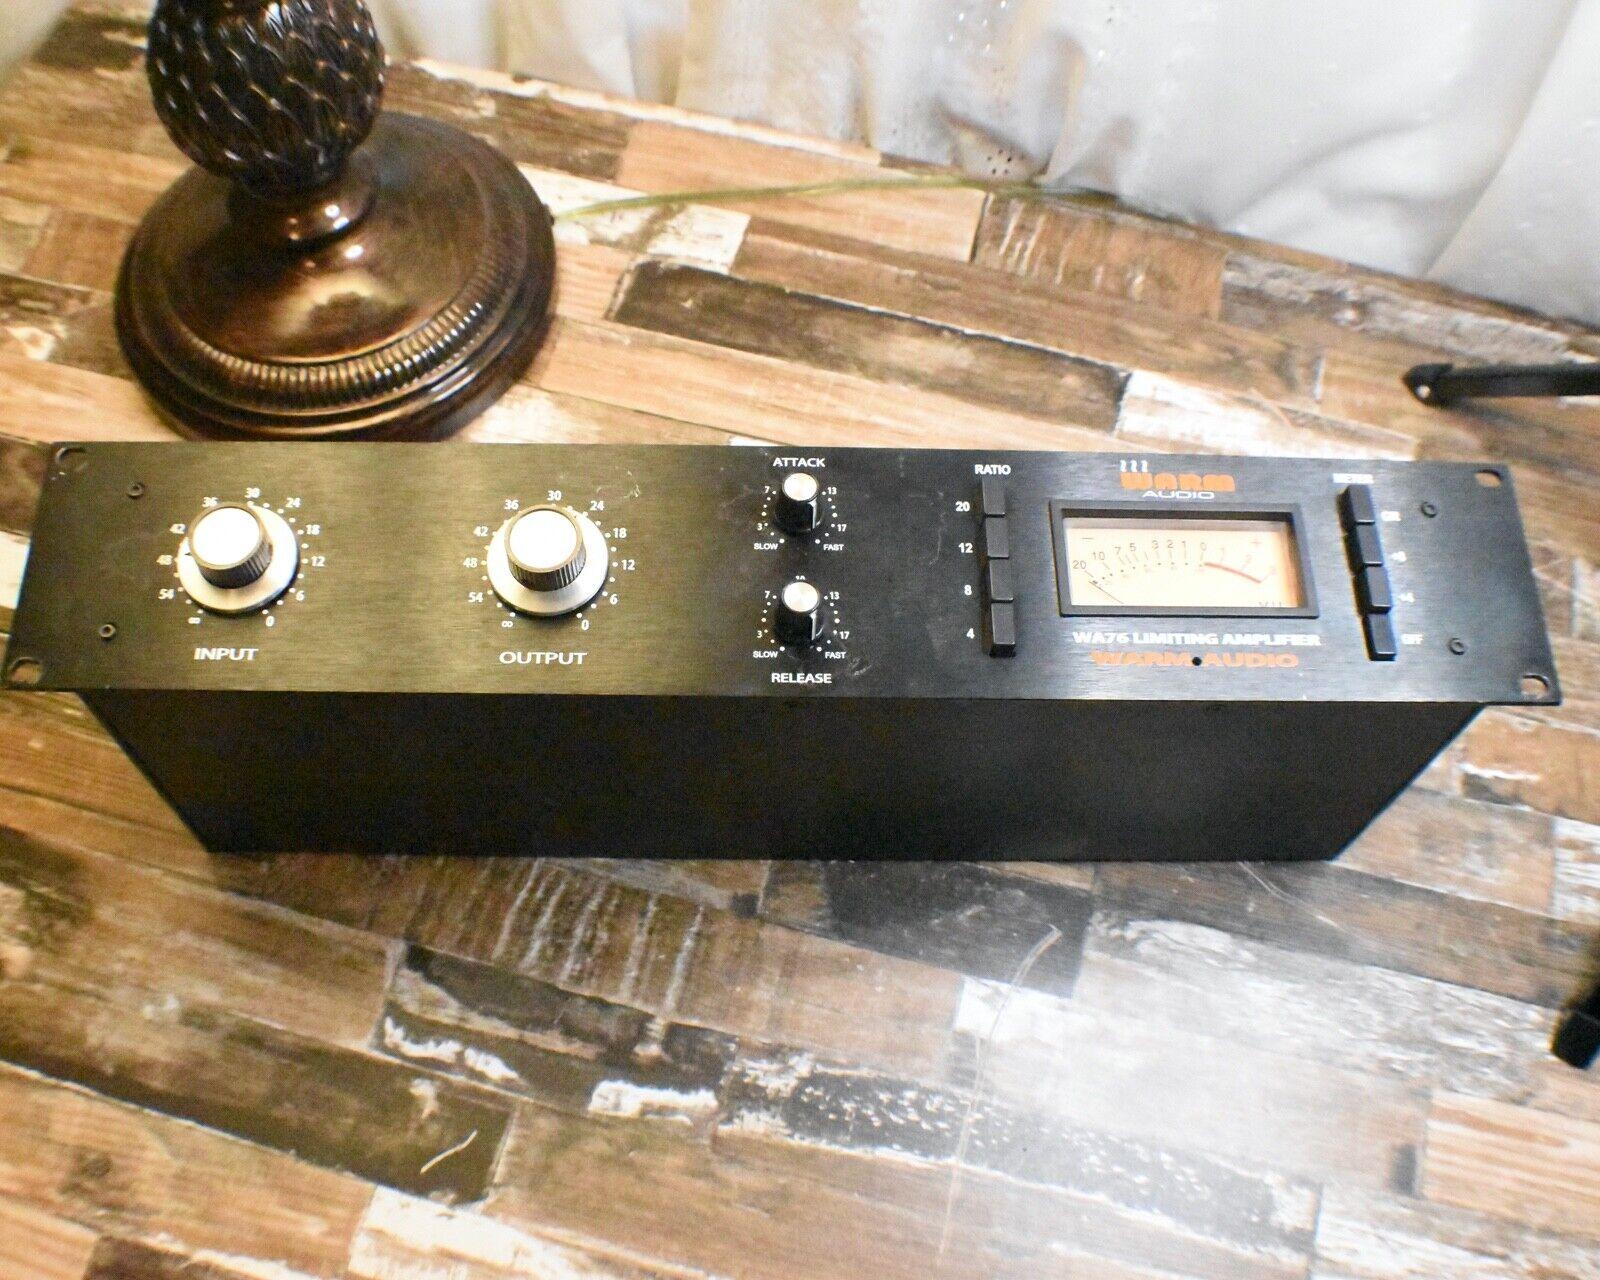 Warm Audio WA76 Discrete Compressor. Buy it now for 549.99